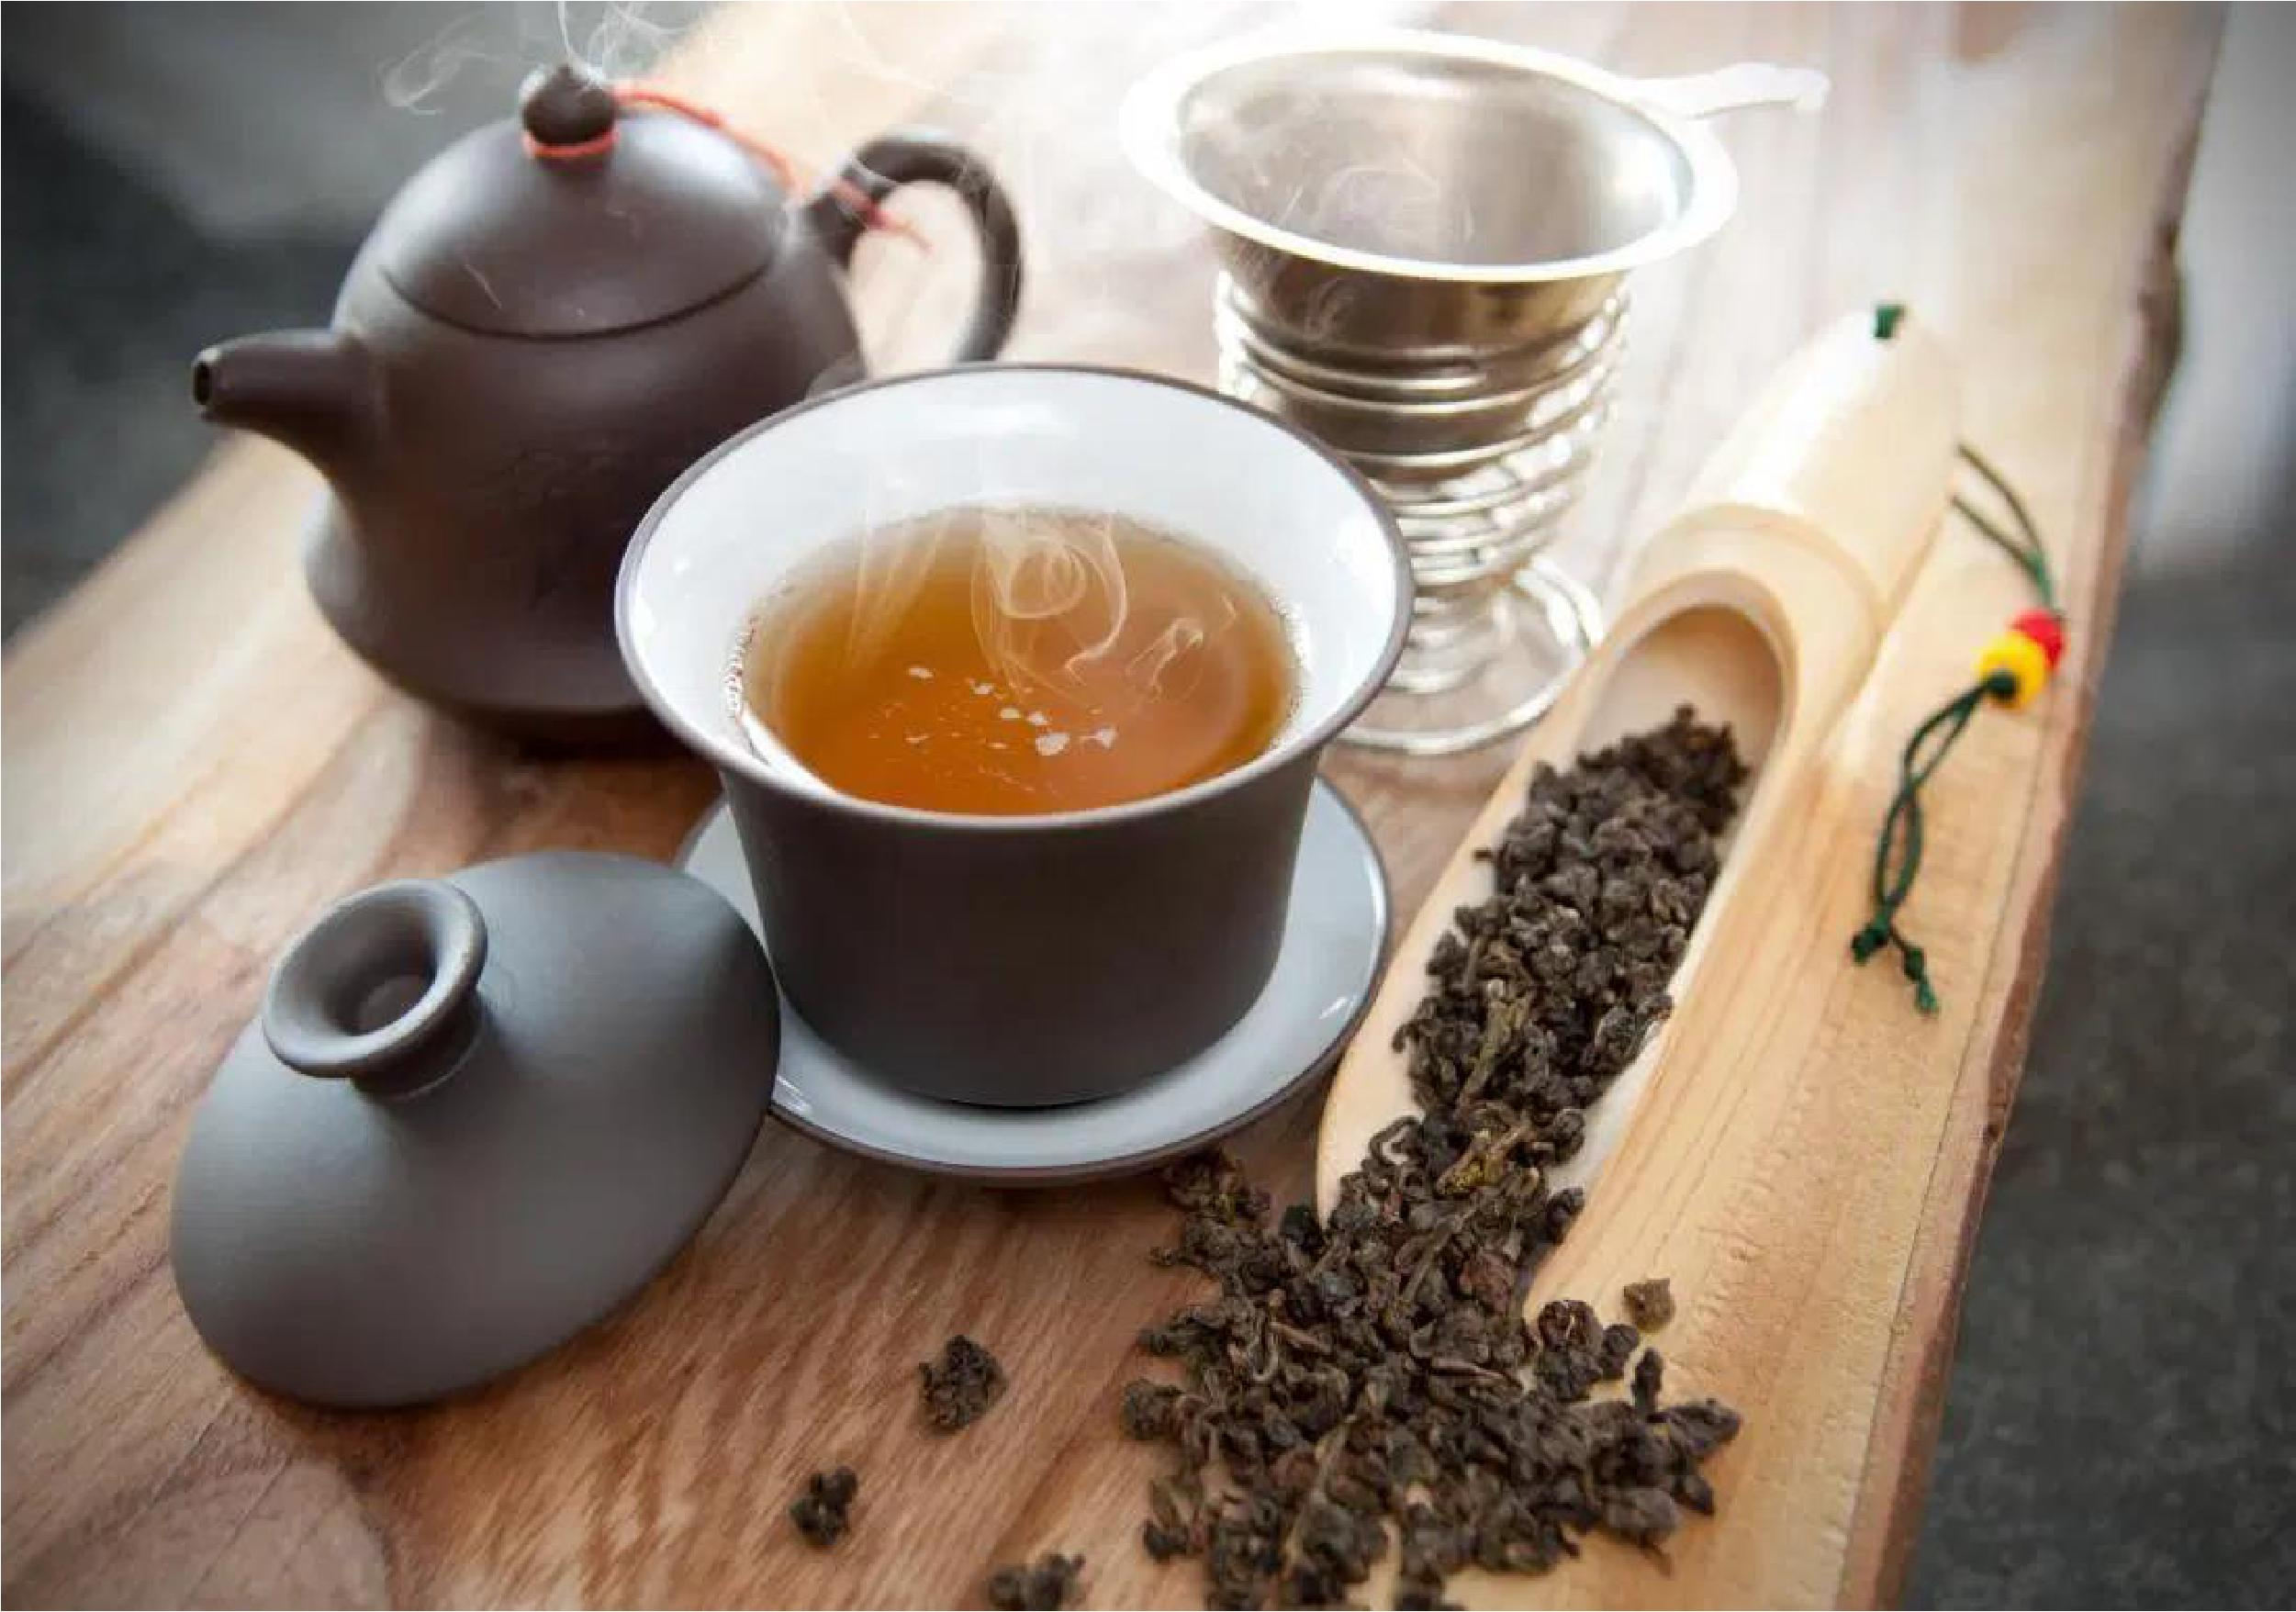 How to Make Oolong Tea